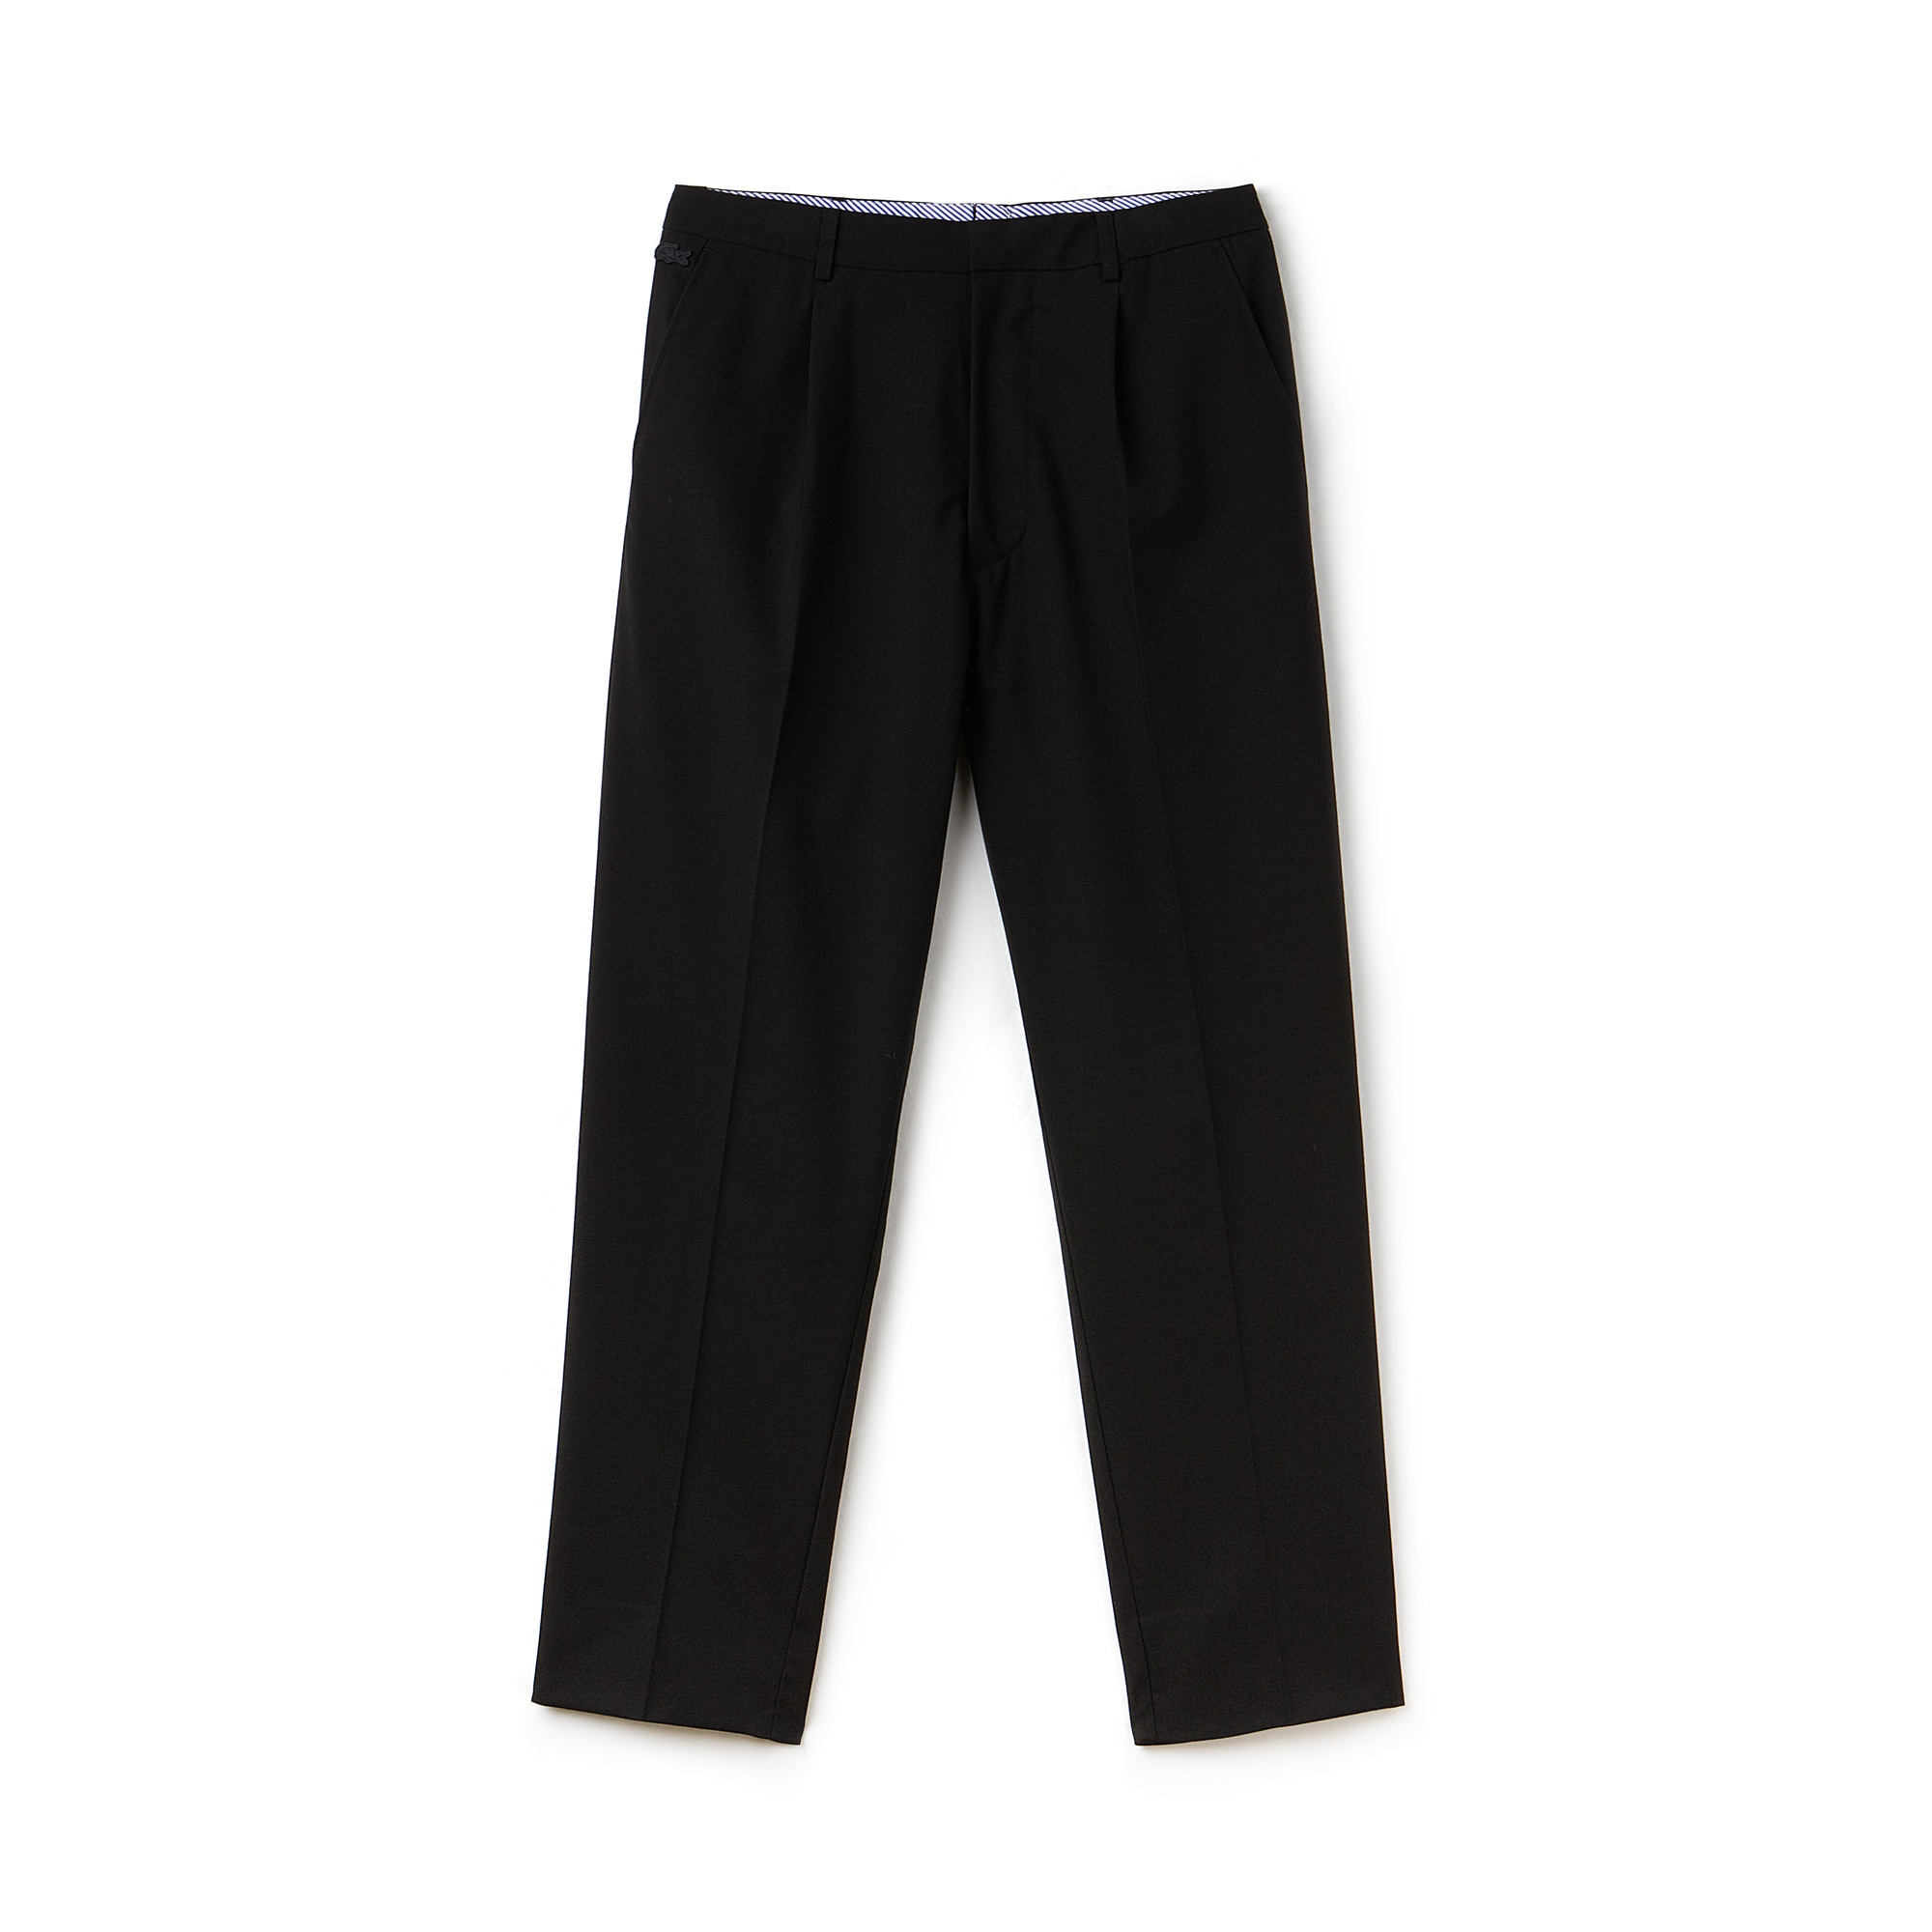 Pantalón chino con pinzas Lacoste LIVE de crepé elástico liso